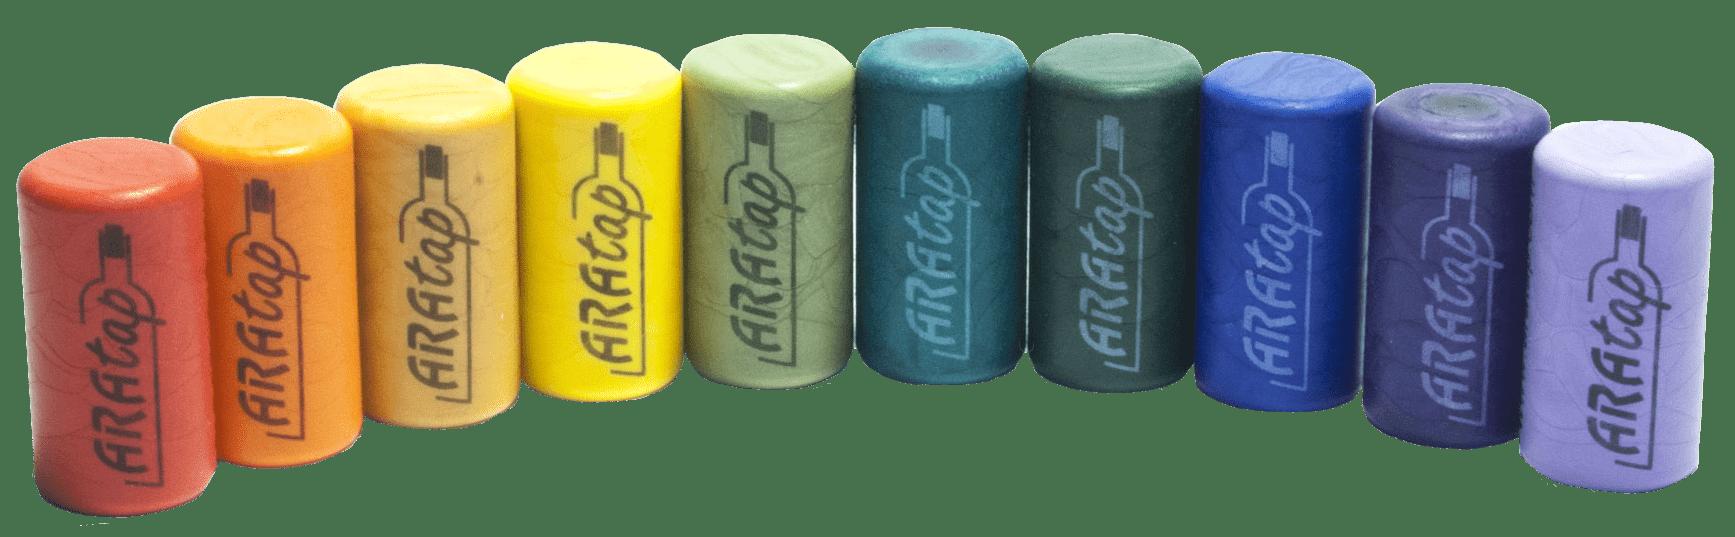 tapones-personalizacion-aratap